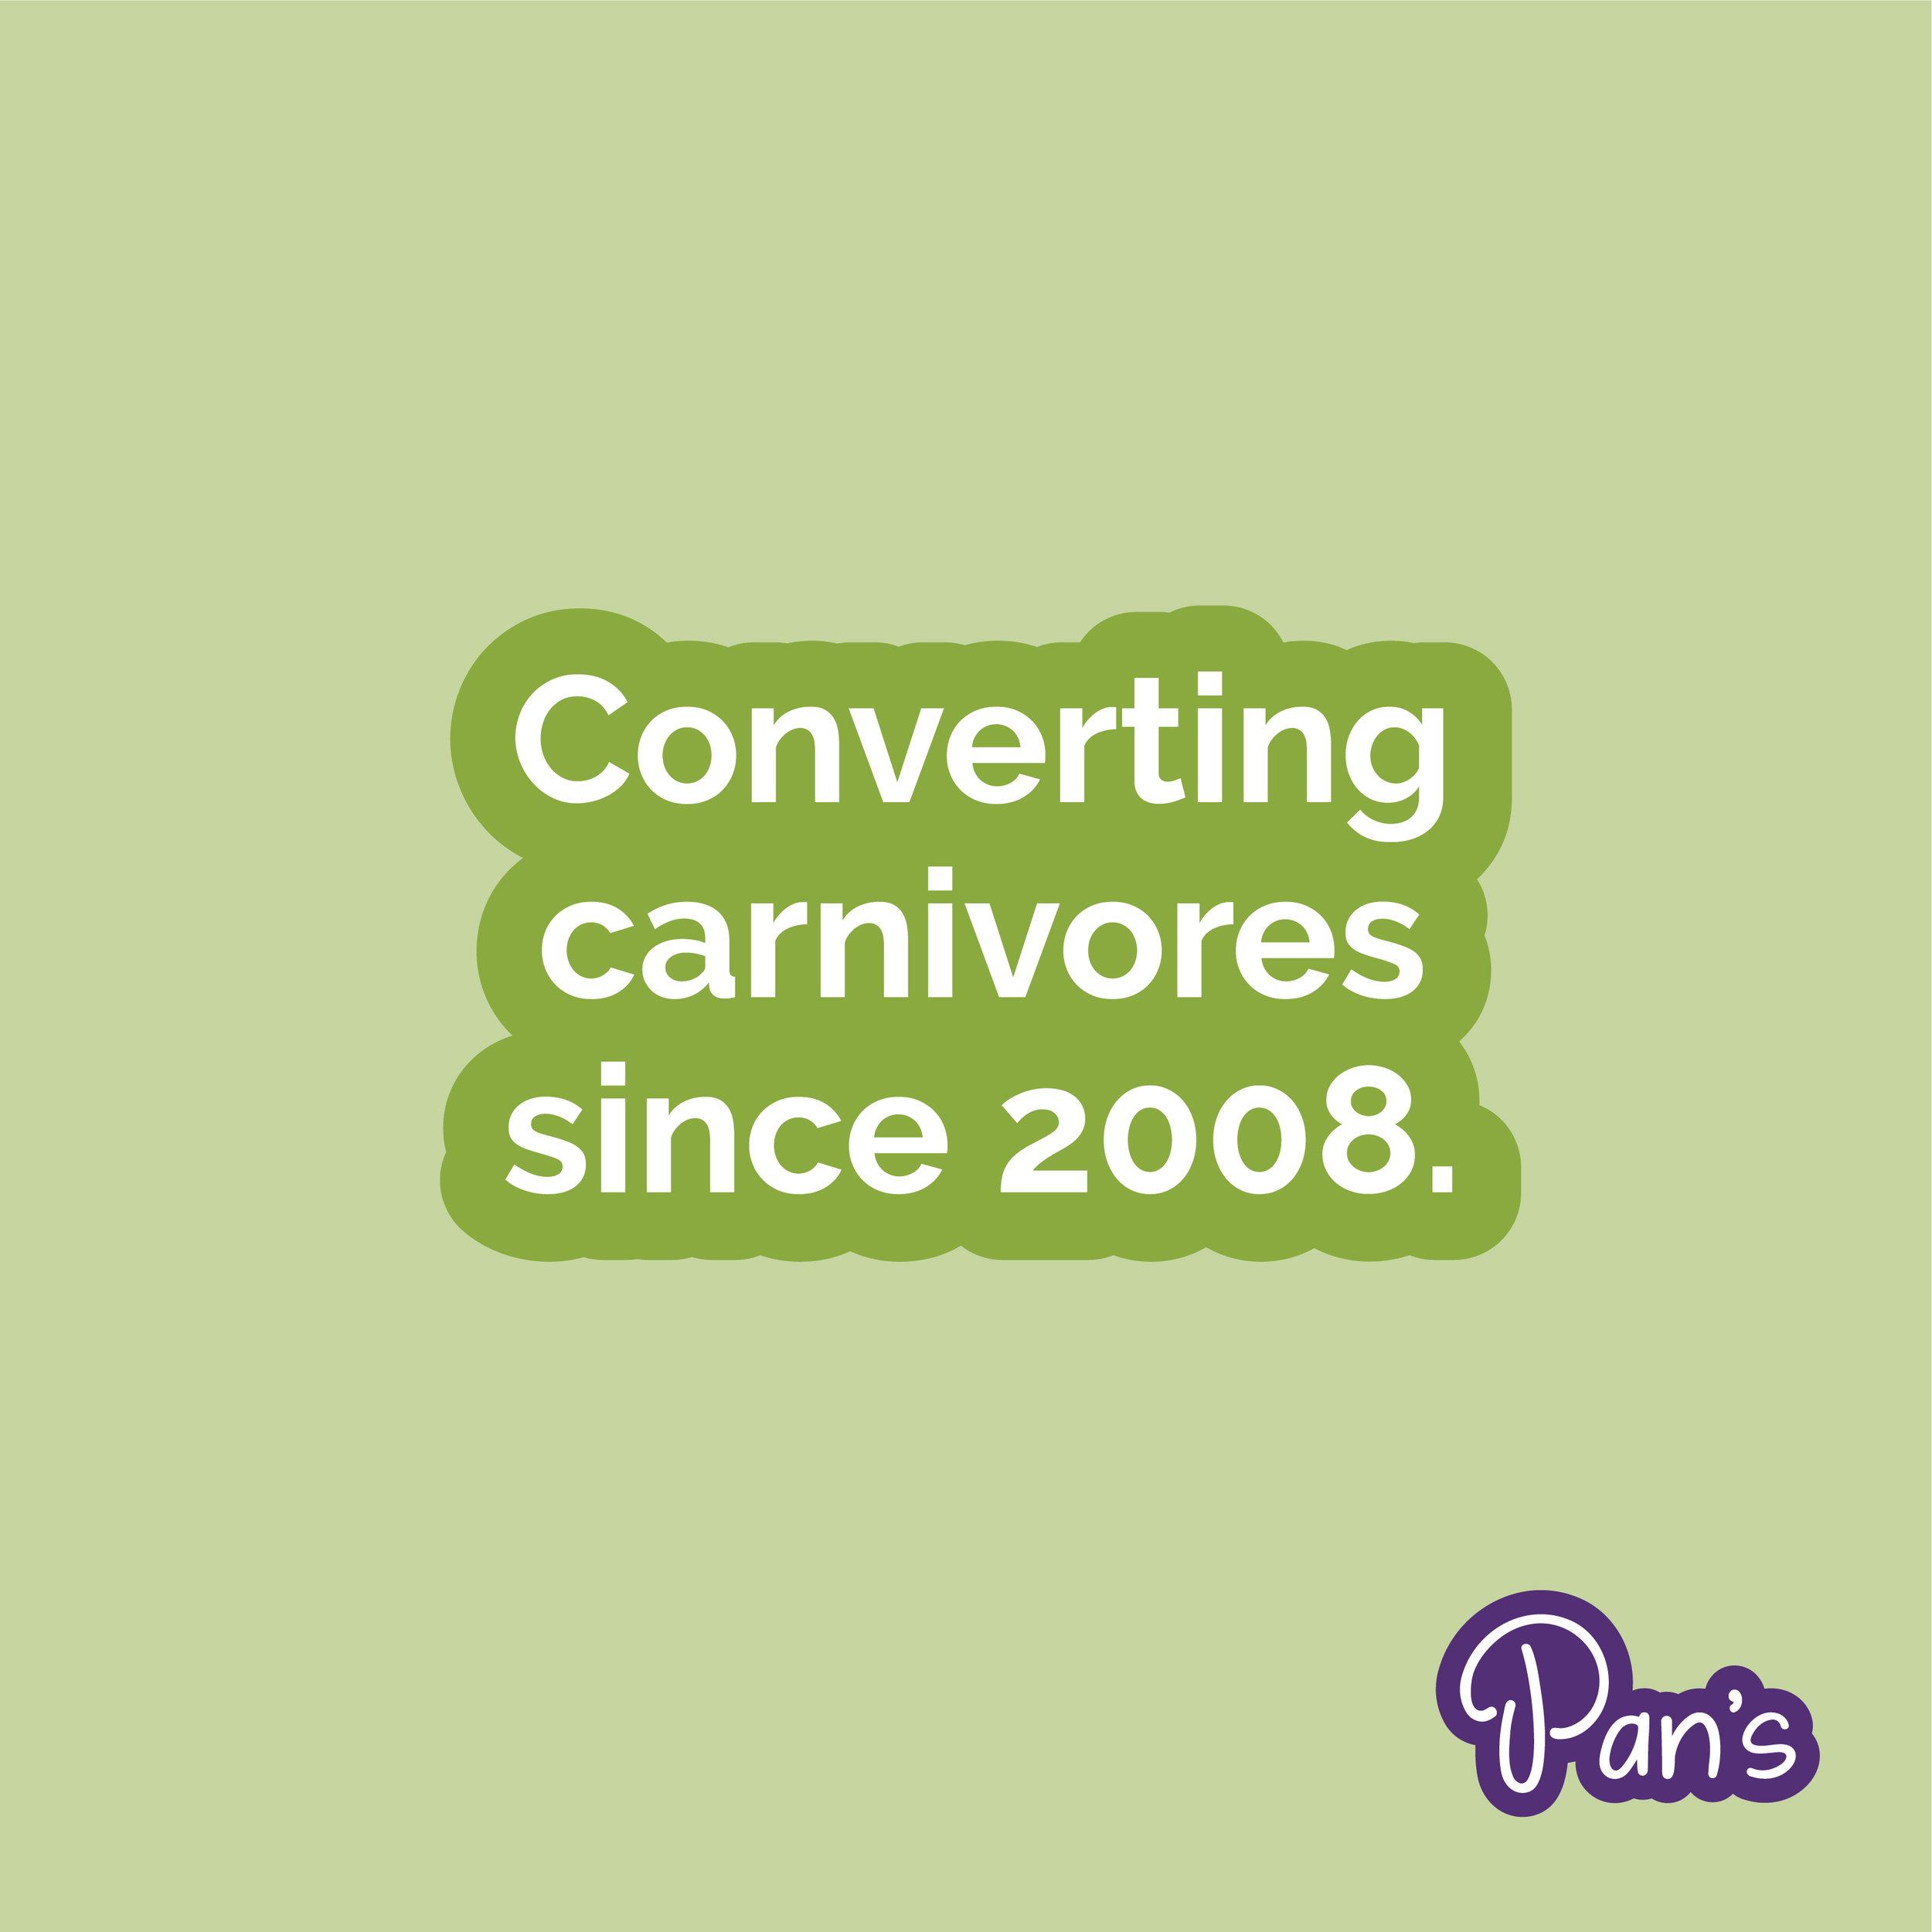 Converting carnivores.jpg